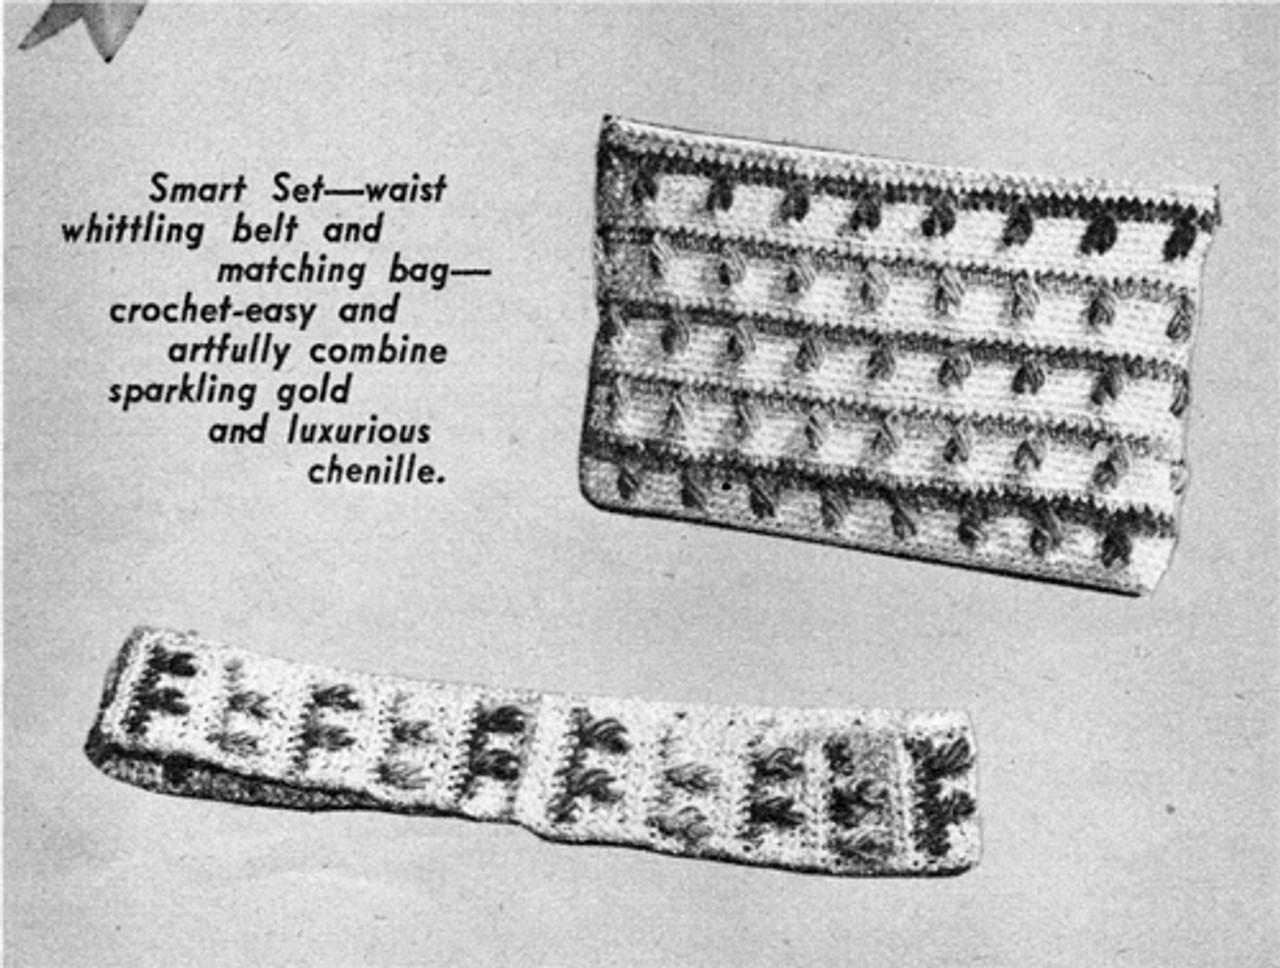 Crochet Zipper Bag with Chenille Trim